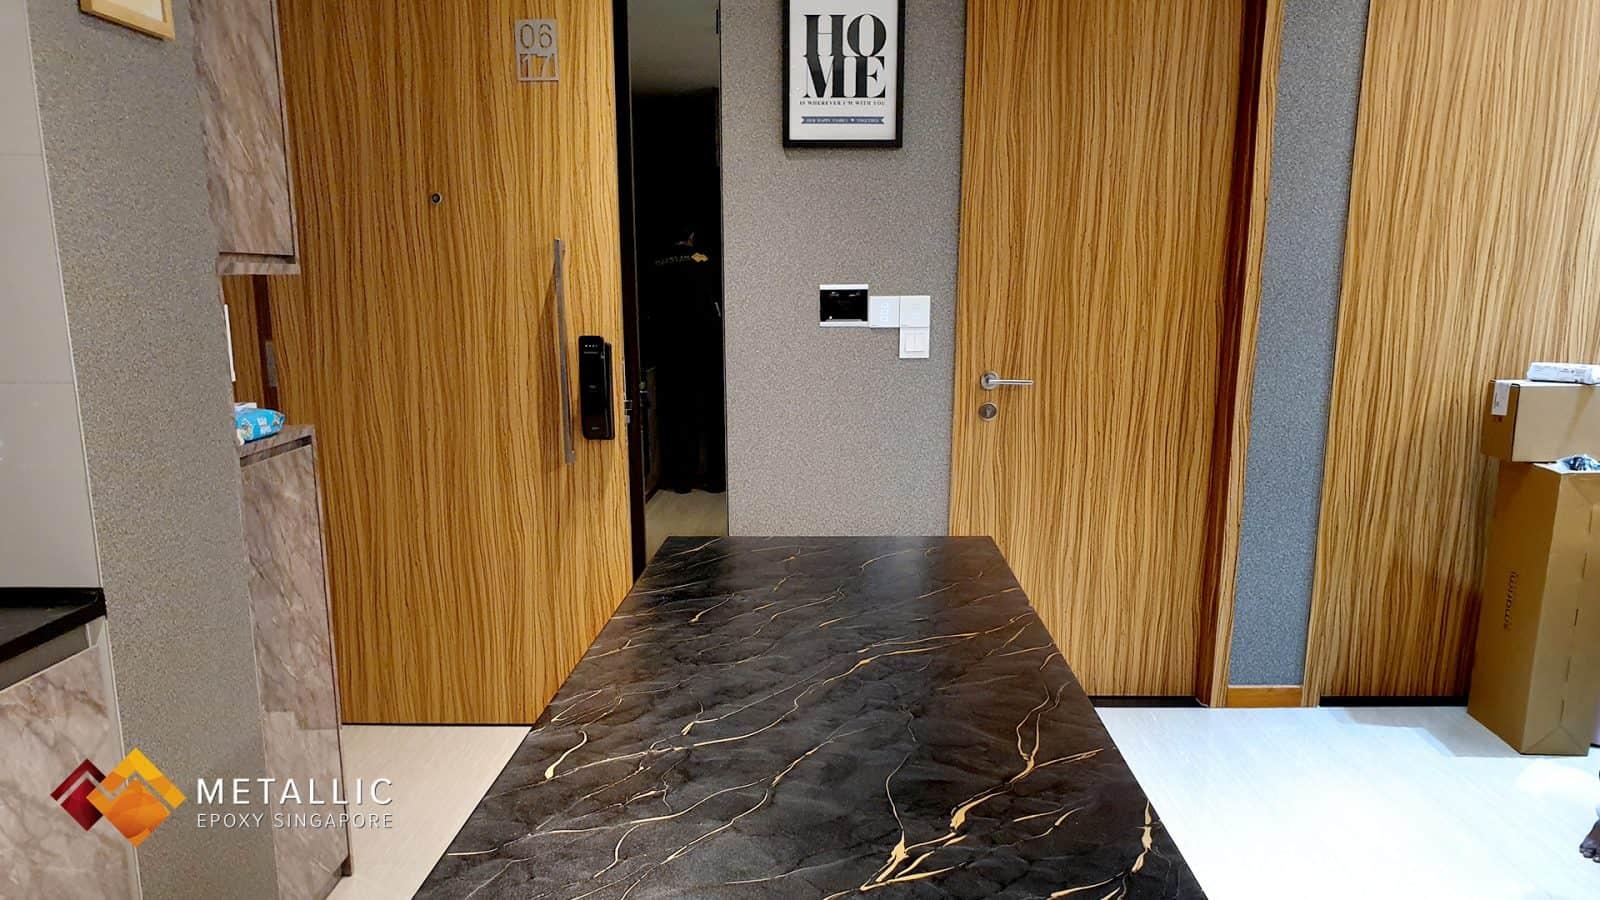 Metallic Epoxy Countertop